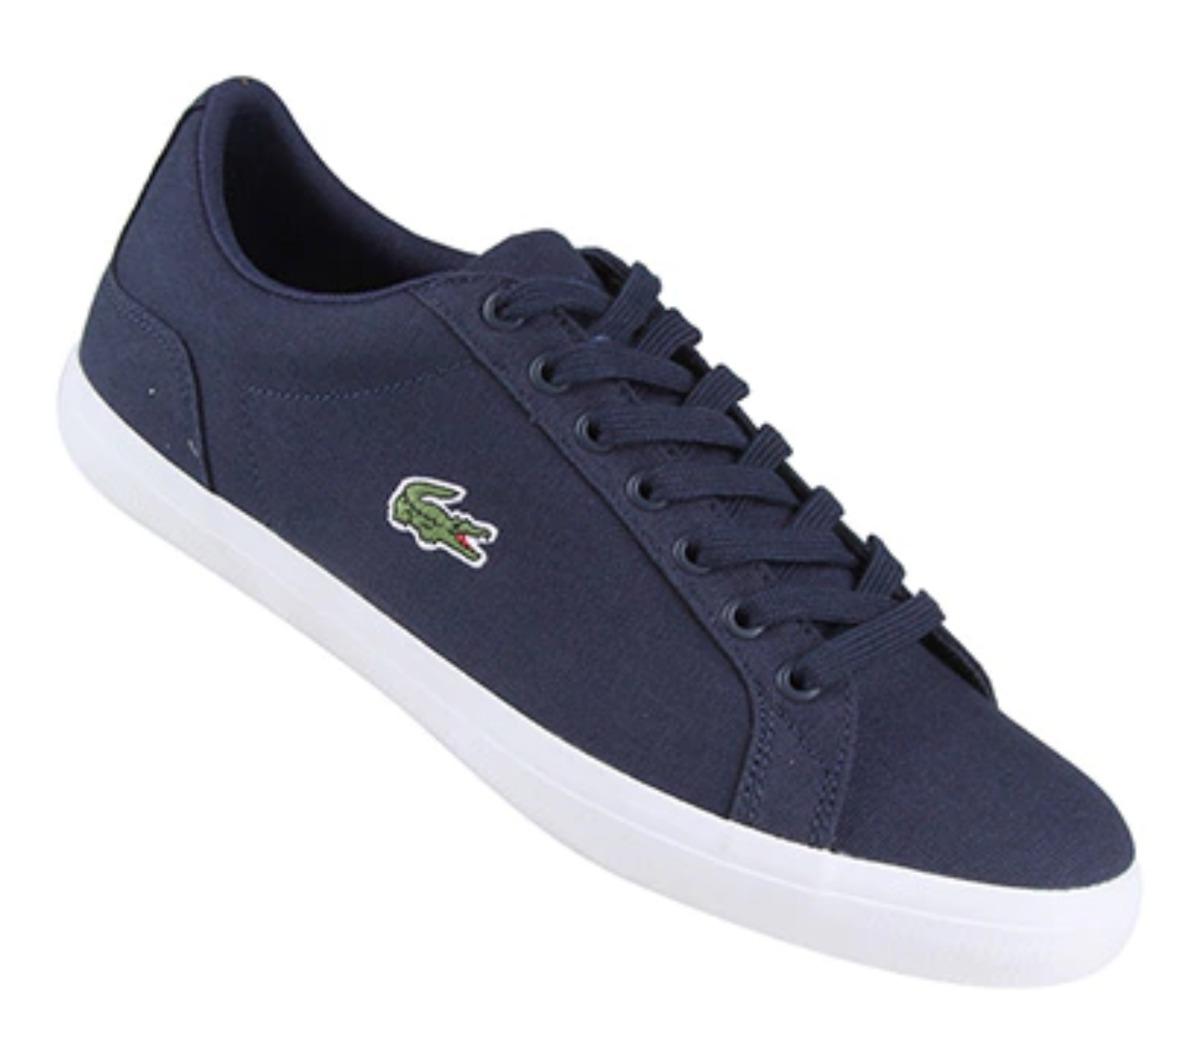 53505dbb498c2 Tenis lacoste lerond azul original masculino carregando zoom jpg 1200x1059 Tenis  masculino lacoste